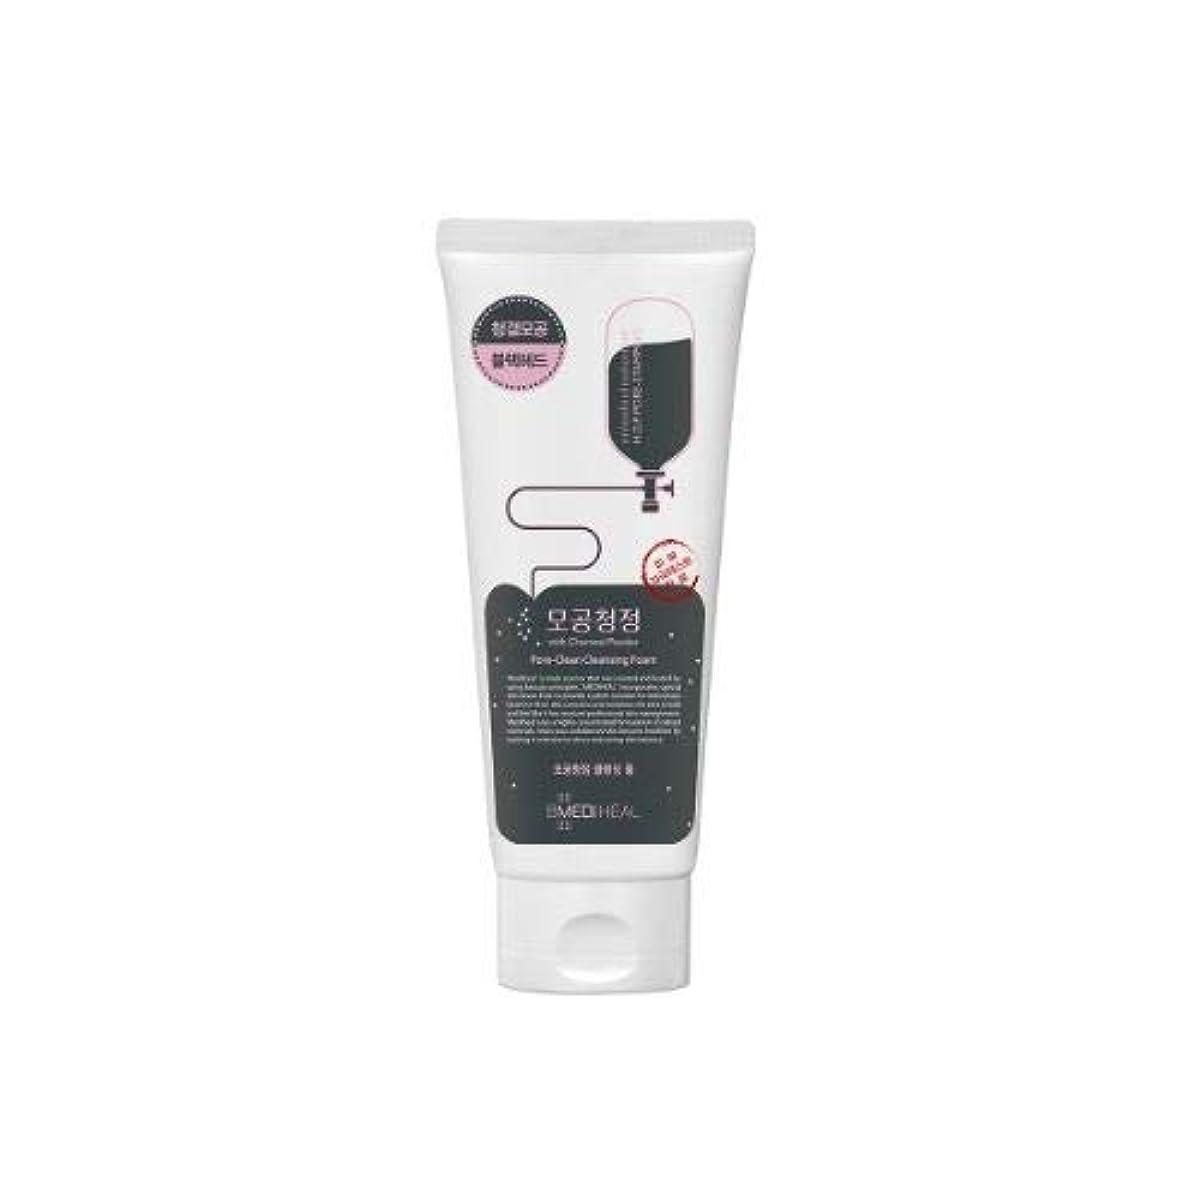 MEDIHEAL Pore-Clean Cleansing Foam メディヒール ポア クリーン クレンジング フォーム 170ml [並行輸入品]